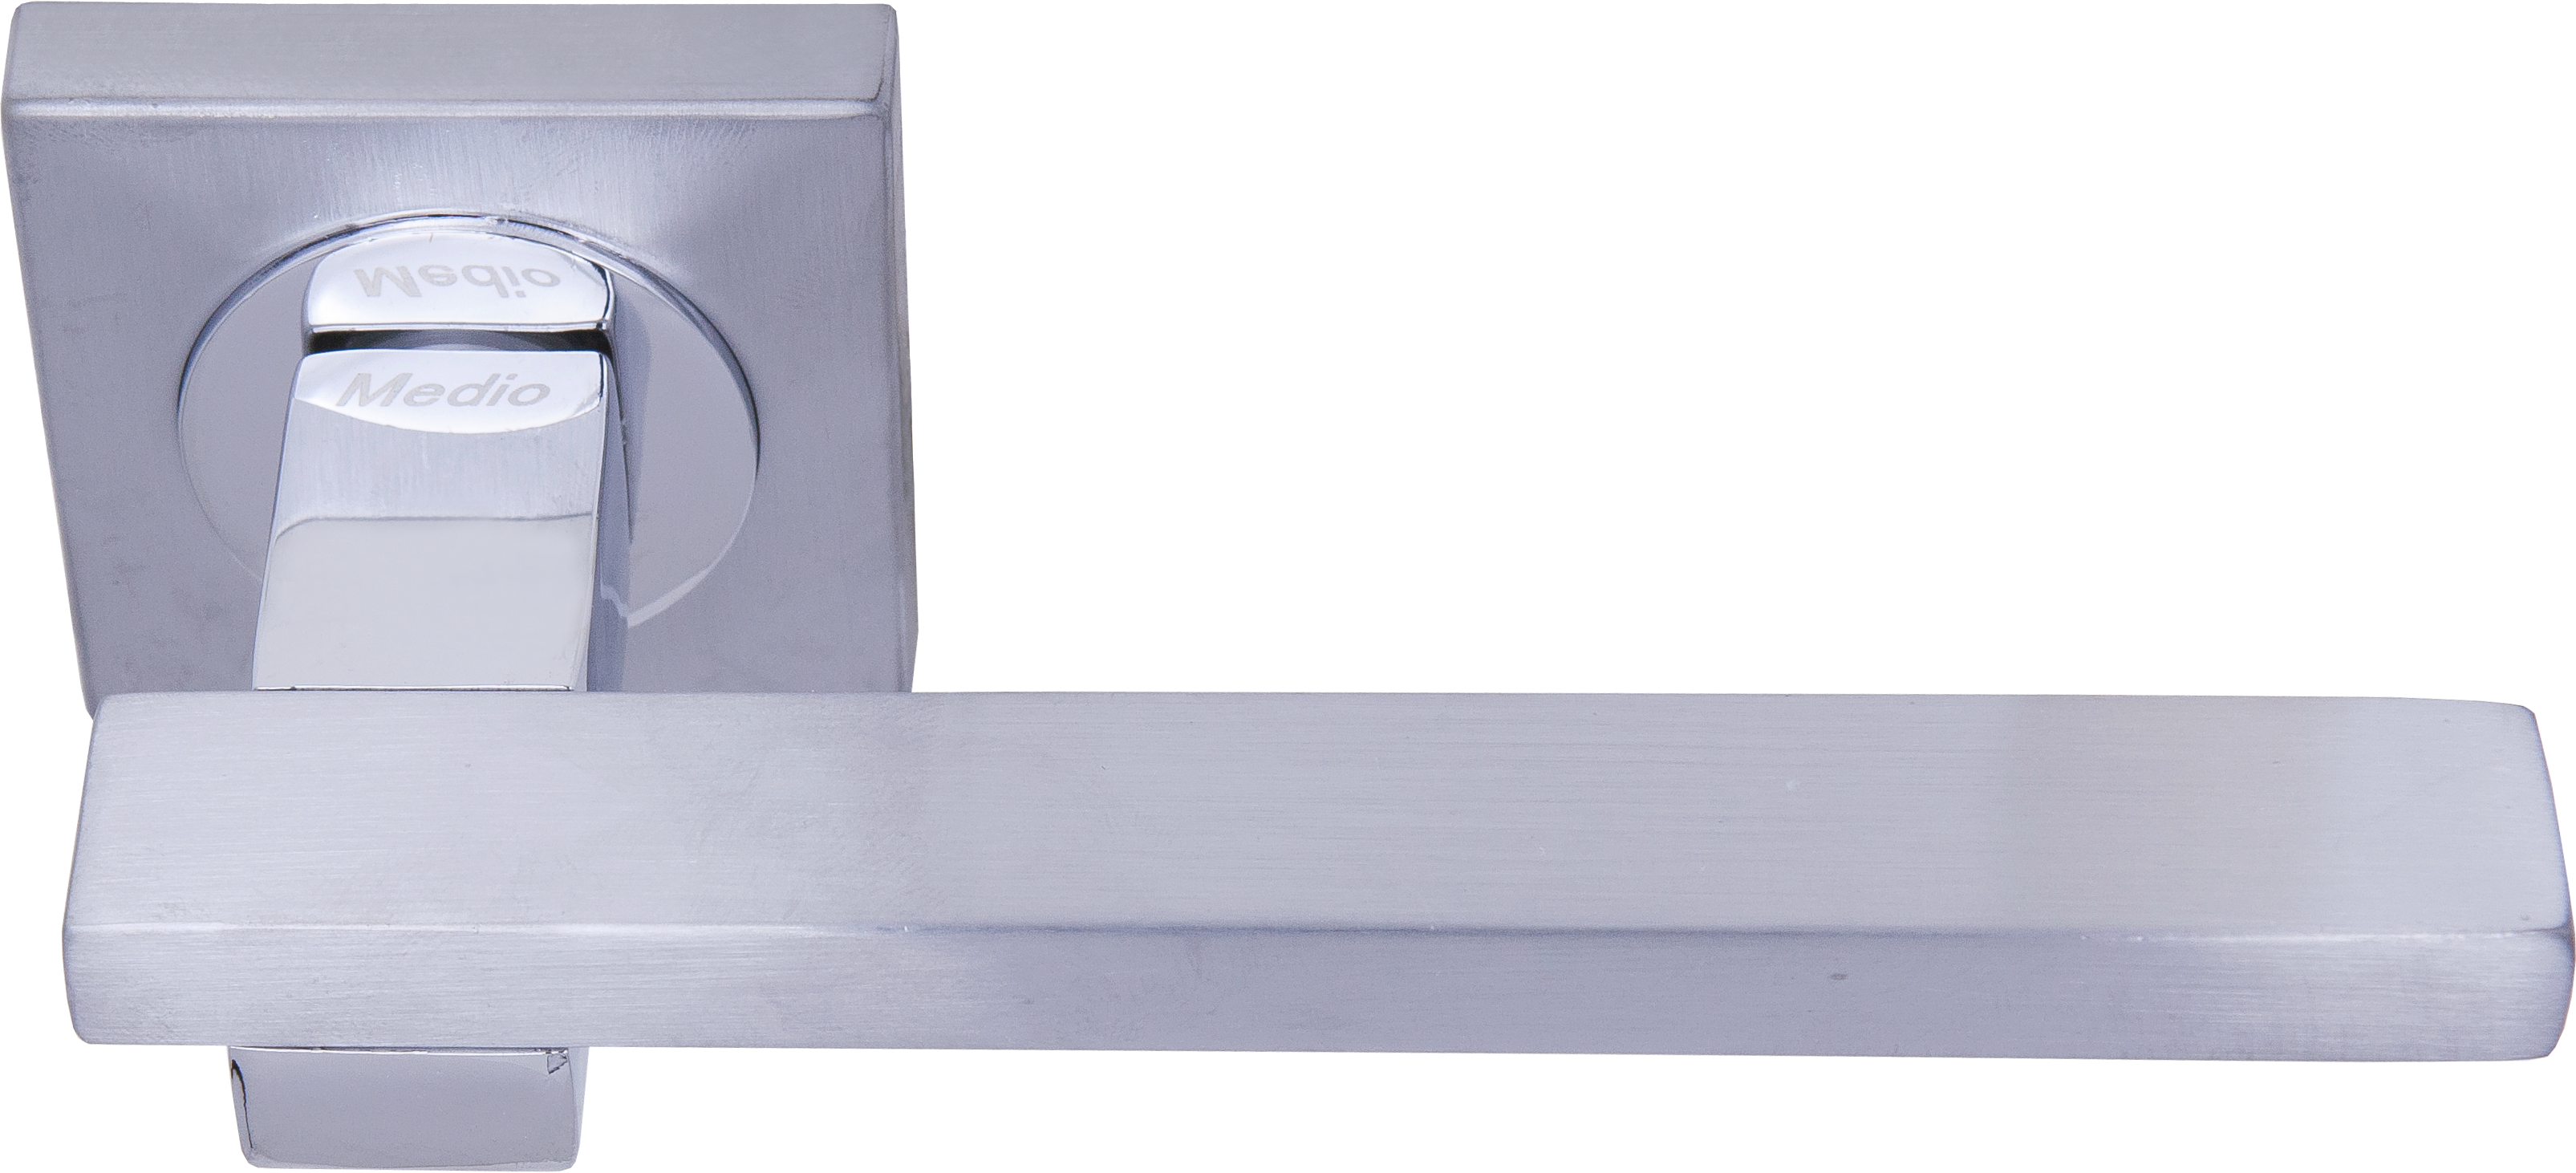 Ручка Медио L09-114 TSC/CP мат.хром/хром (20 шт)